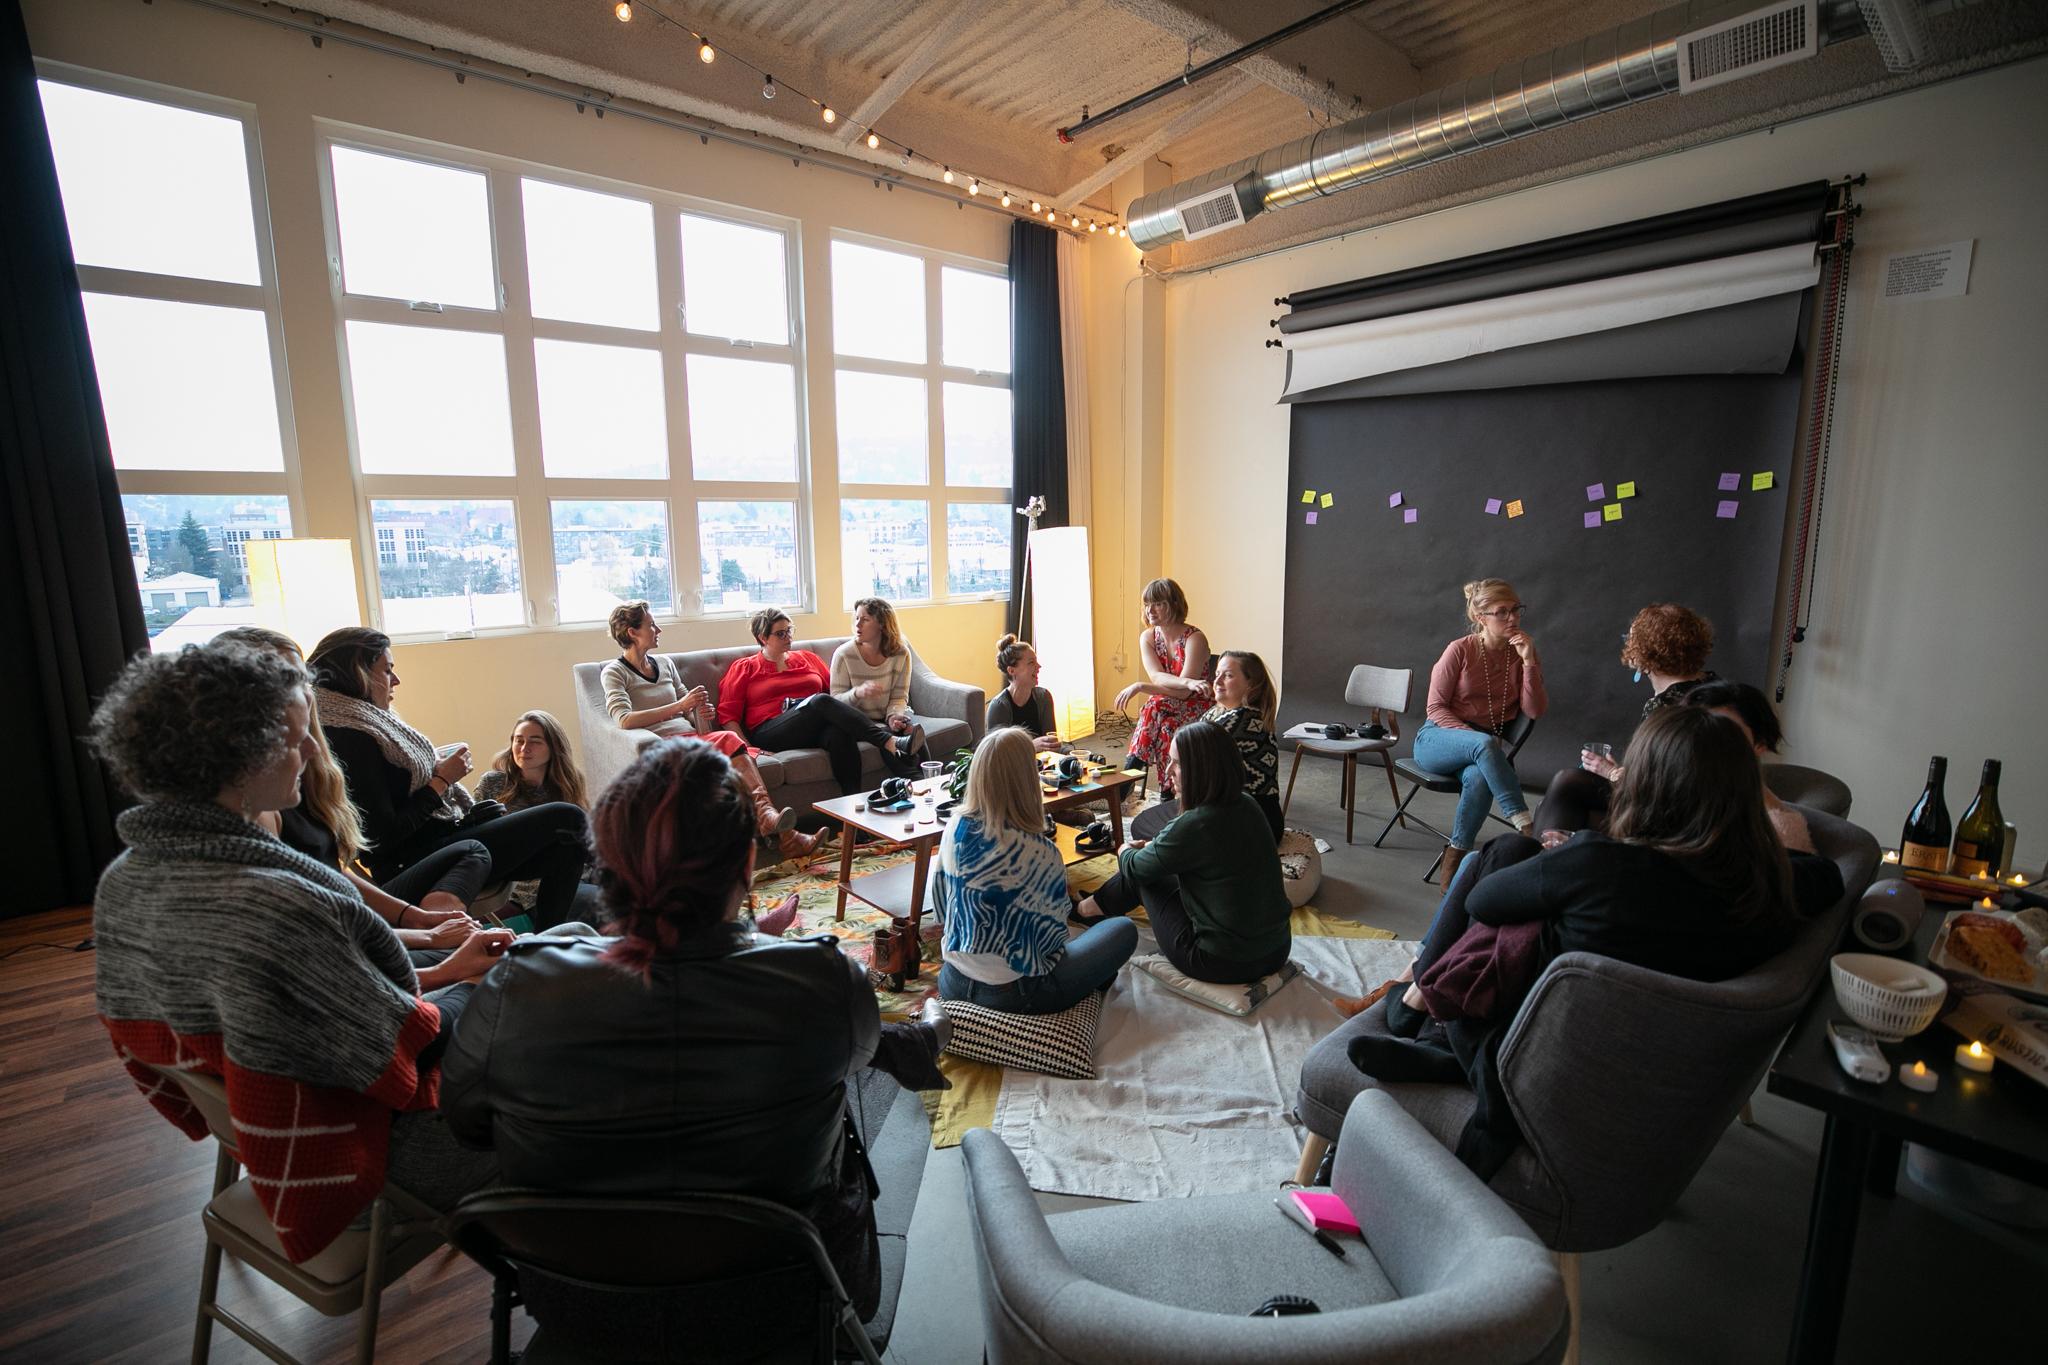 Awakening - a 6 week small group clarity class.